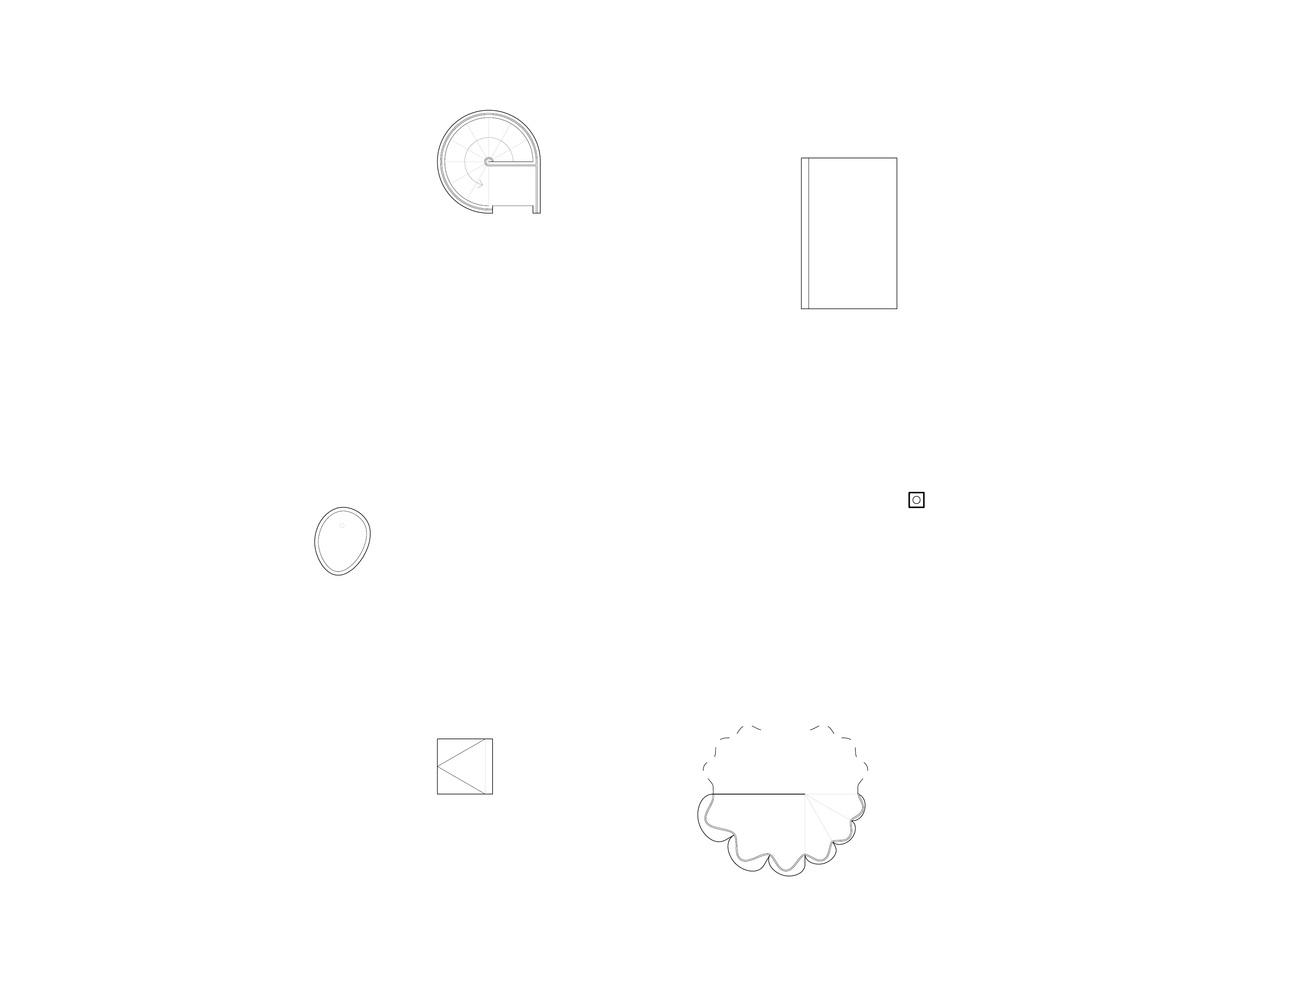 PARA-Project-.-Stump-House-.-Ben-Lomond-afasia-11.jpg